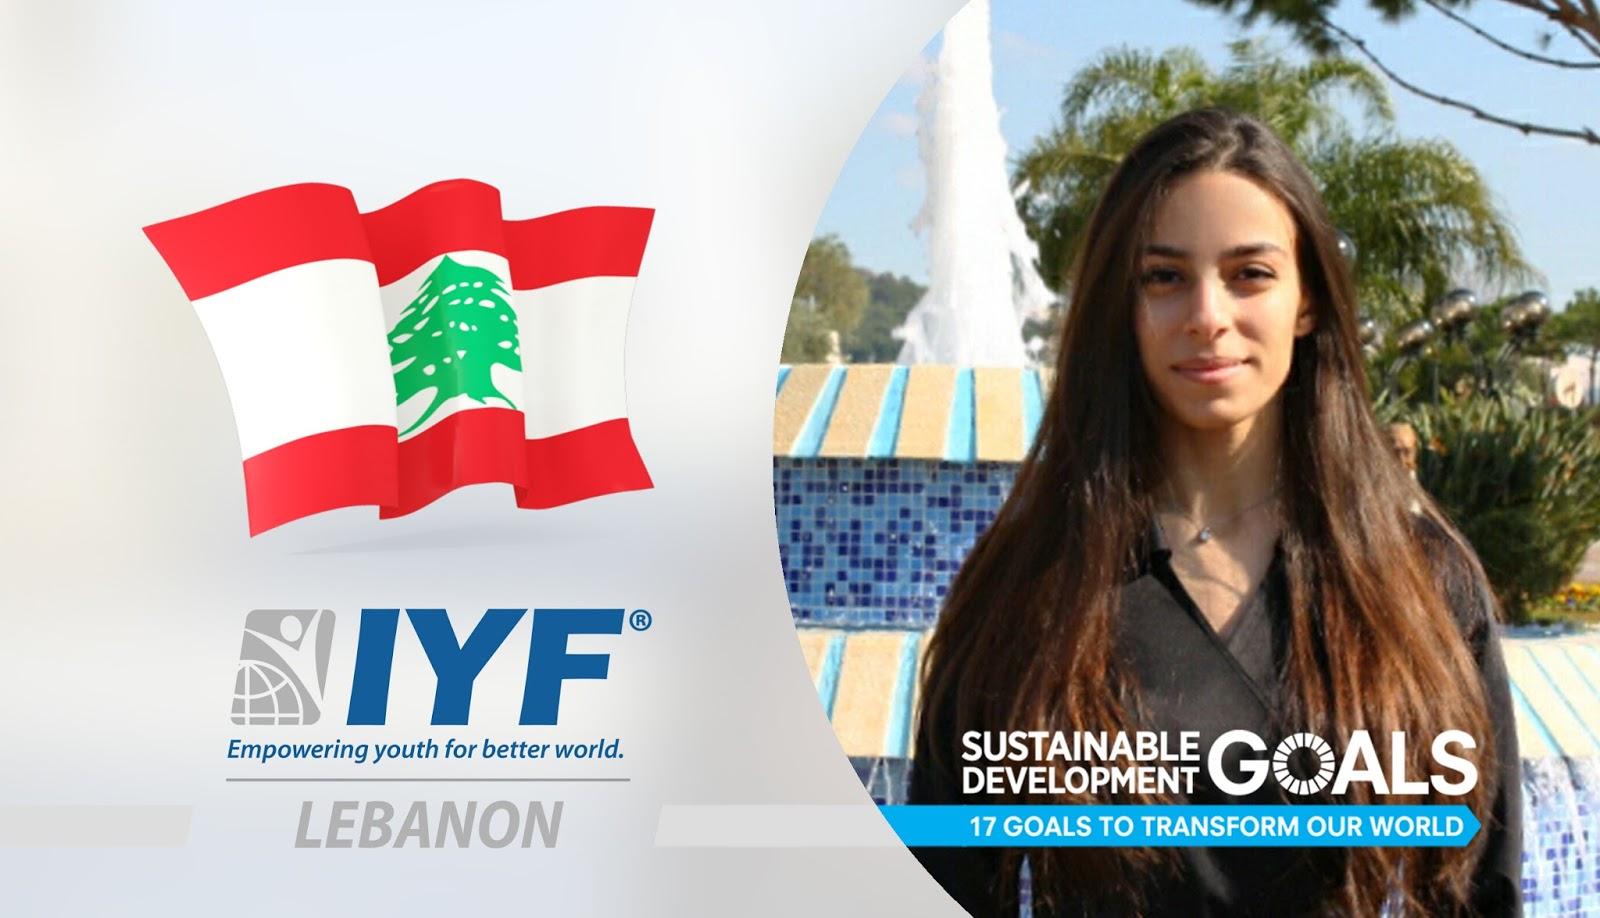 Maryam Nsaif, IYF Representative in Lebanon